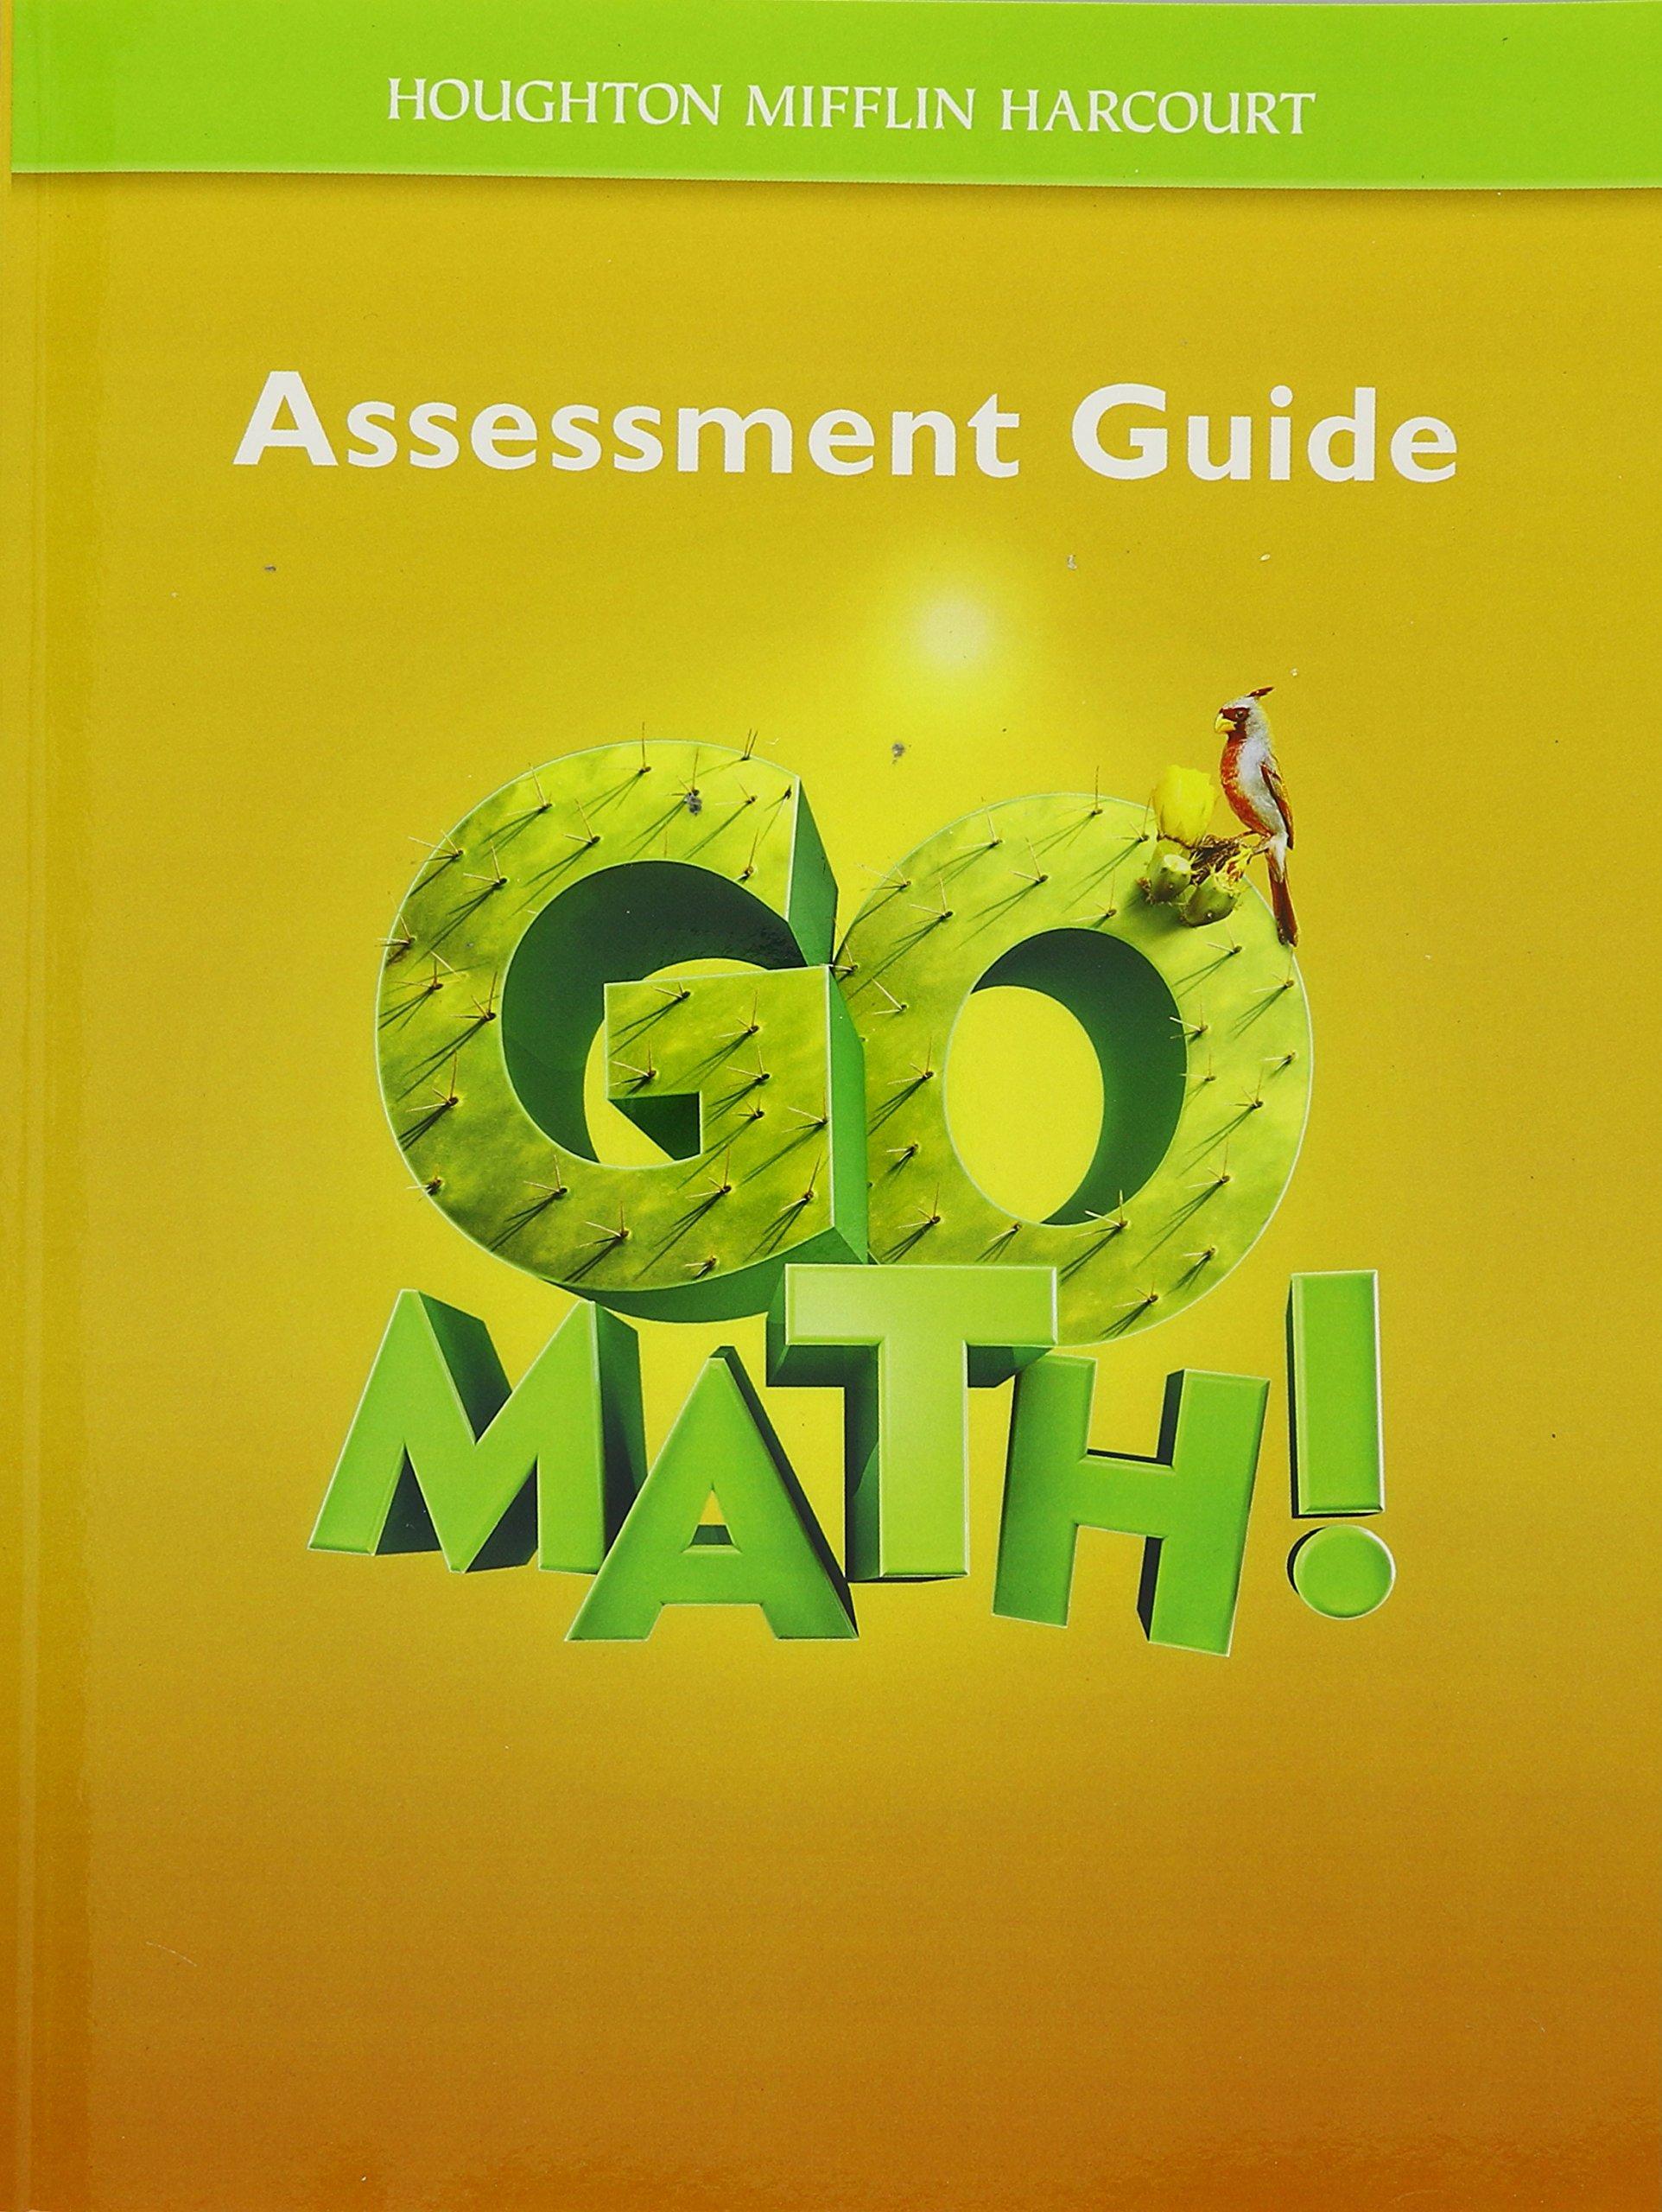 Assessment Guide Grade 5: HOUGHTON MIFFLIN HARCOURT: 9780547392103:  Amazon.com: Books